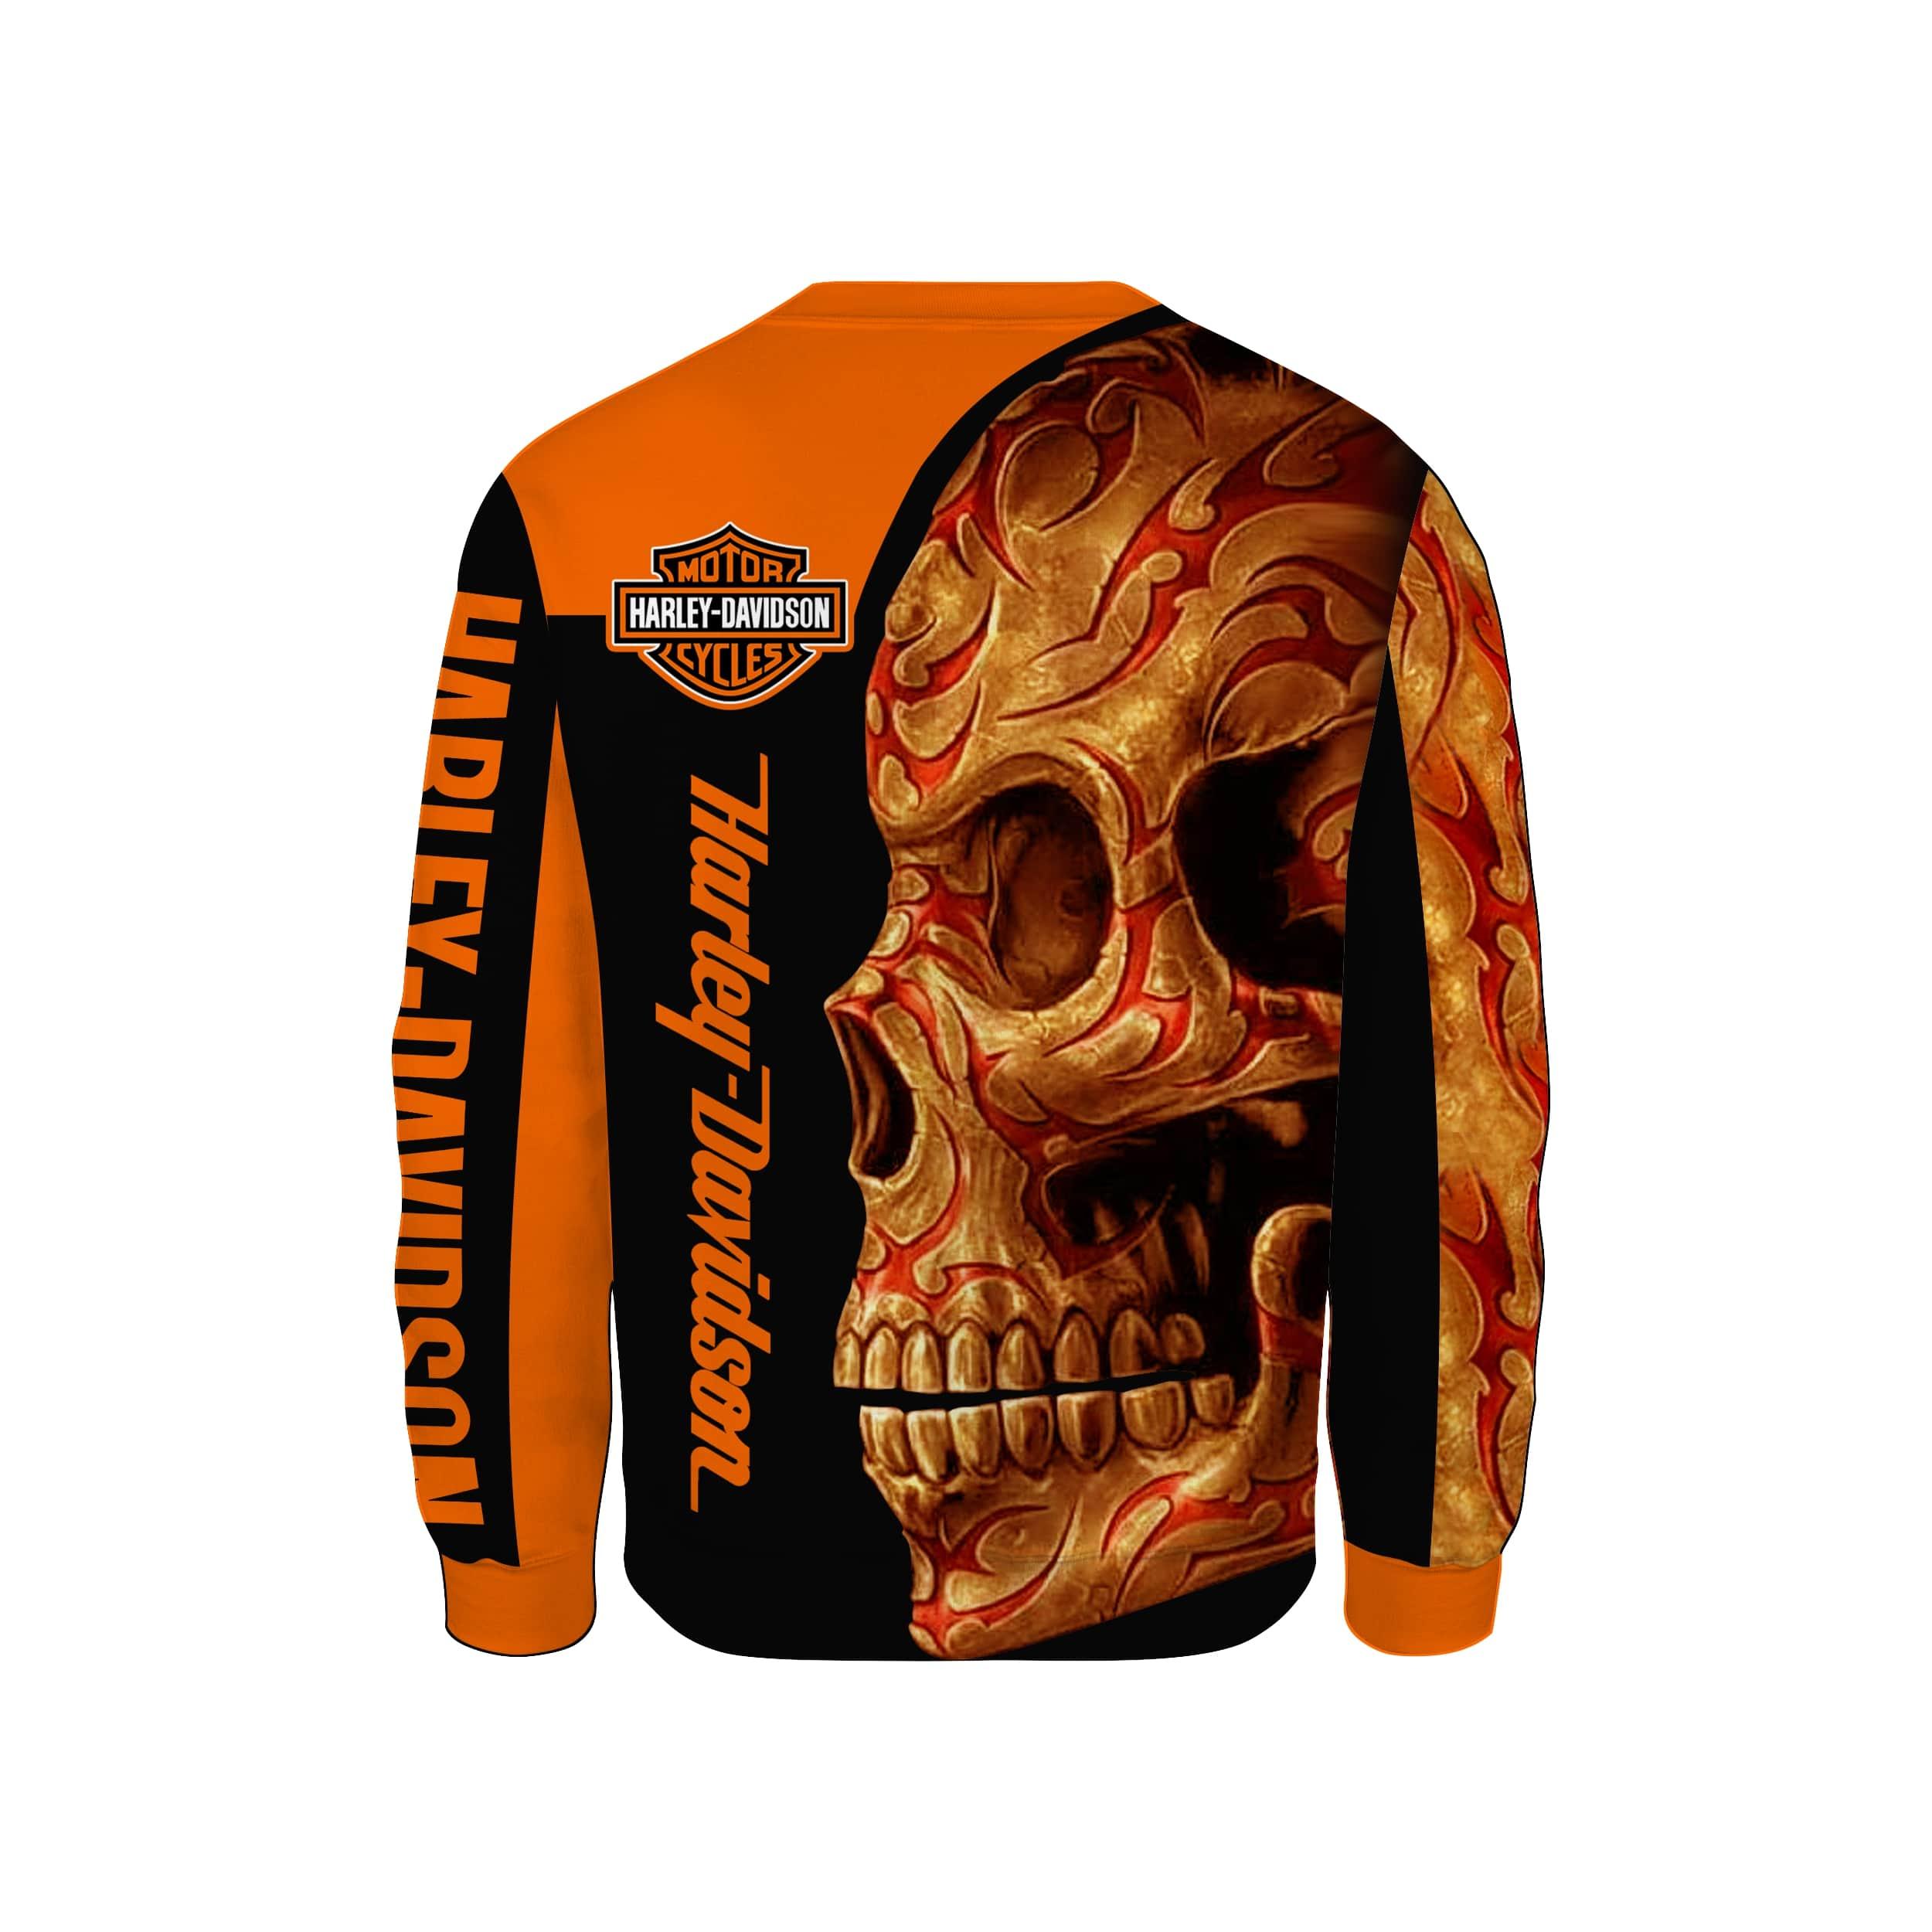 Harley-davidson motorcycle sugar skull full printing sweatshirt 2